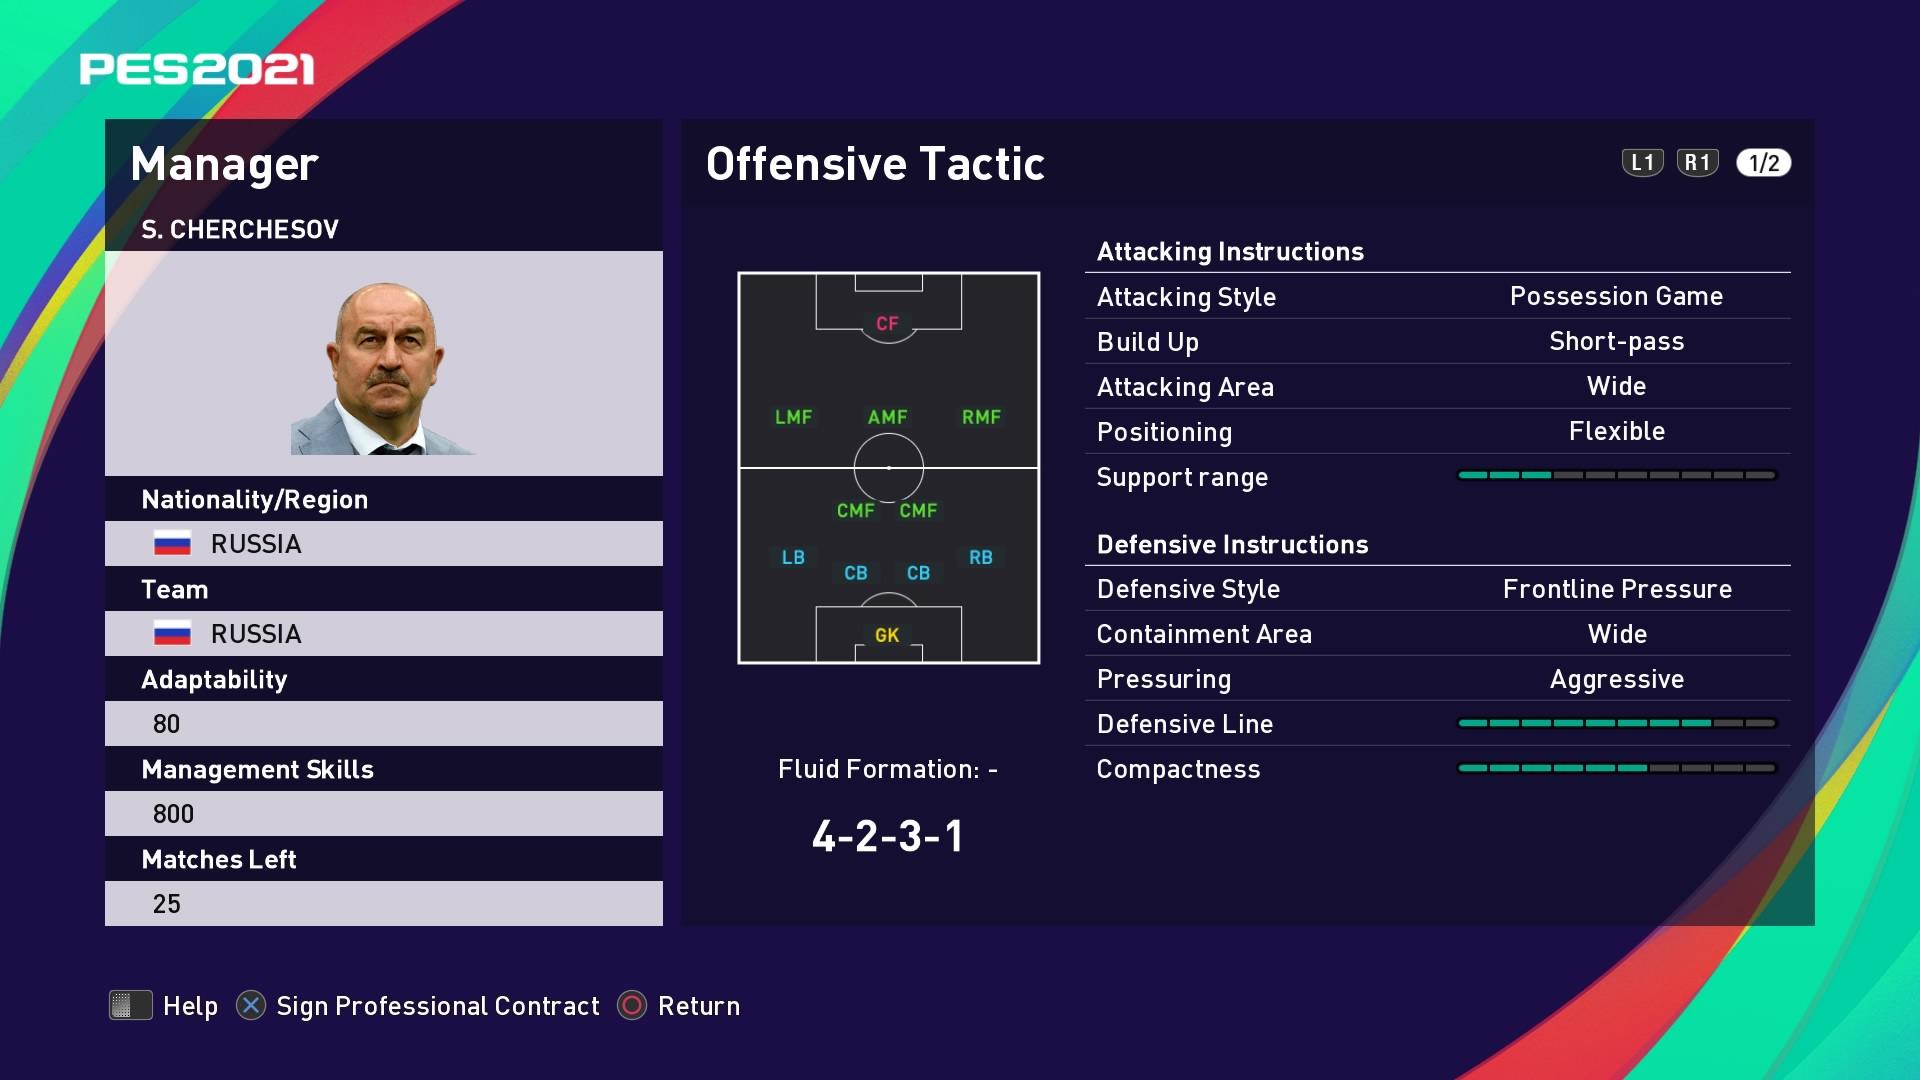 S. Cherchesov (Stanislav Cherchesov) Offensive Tactic in PES 2021 myClub